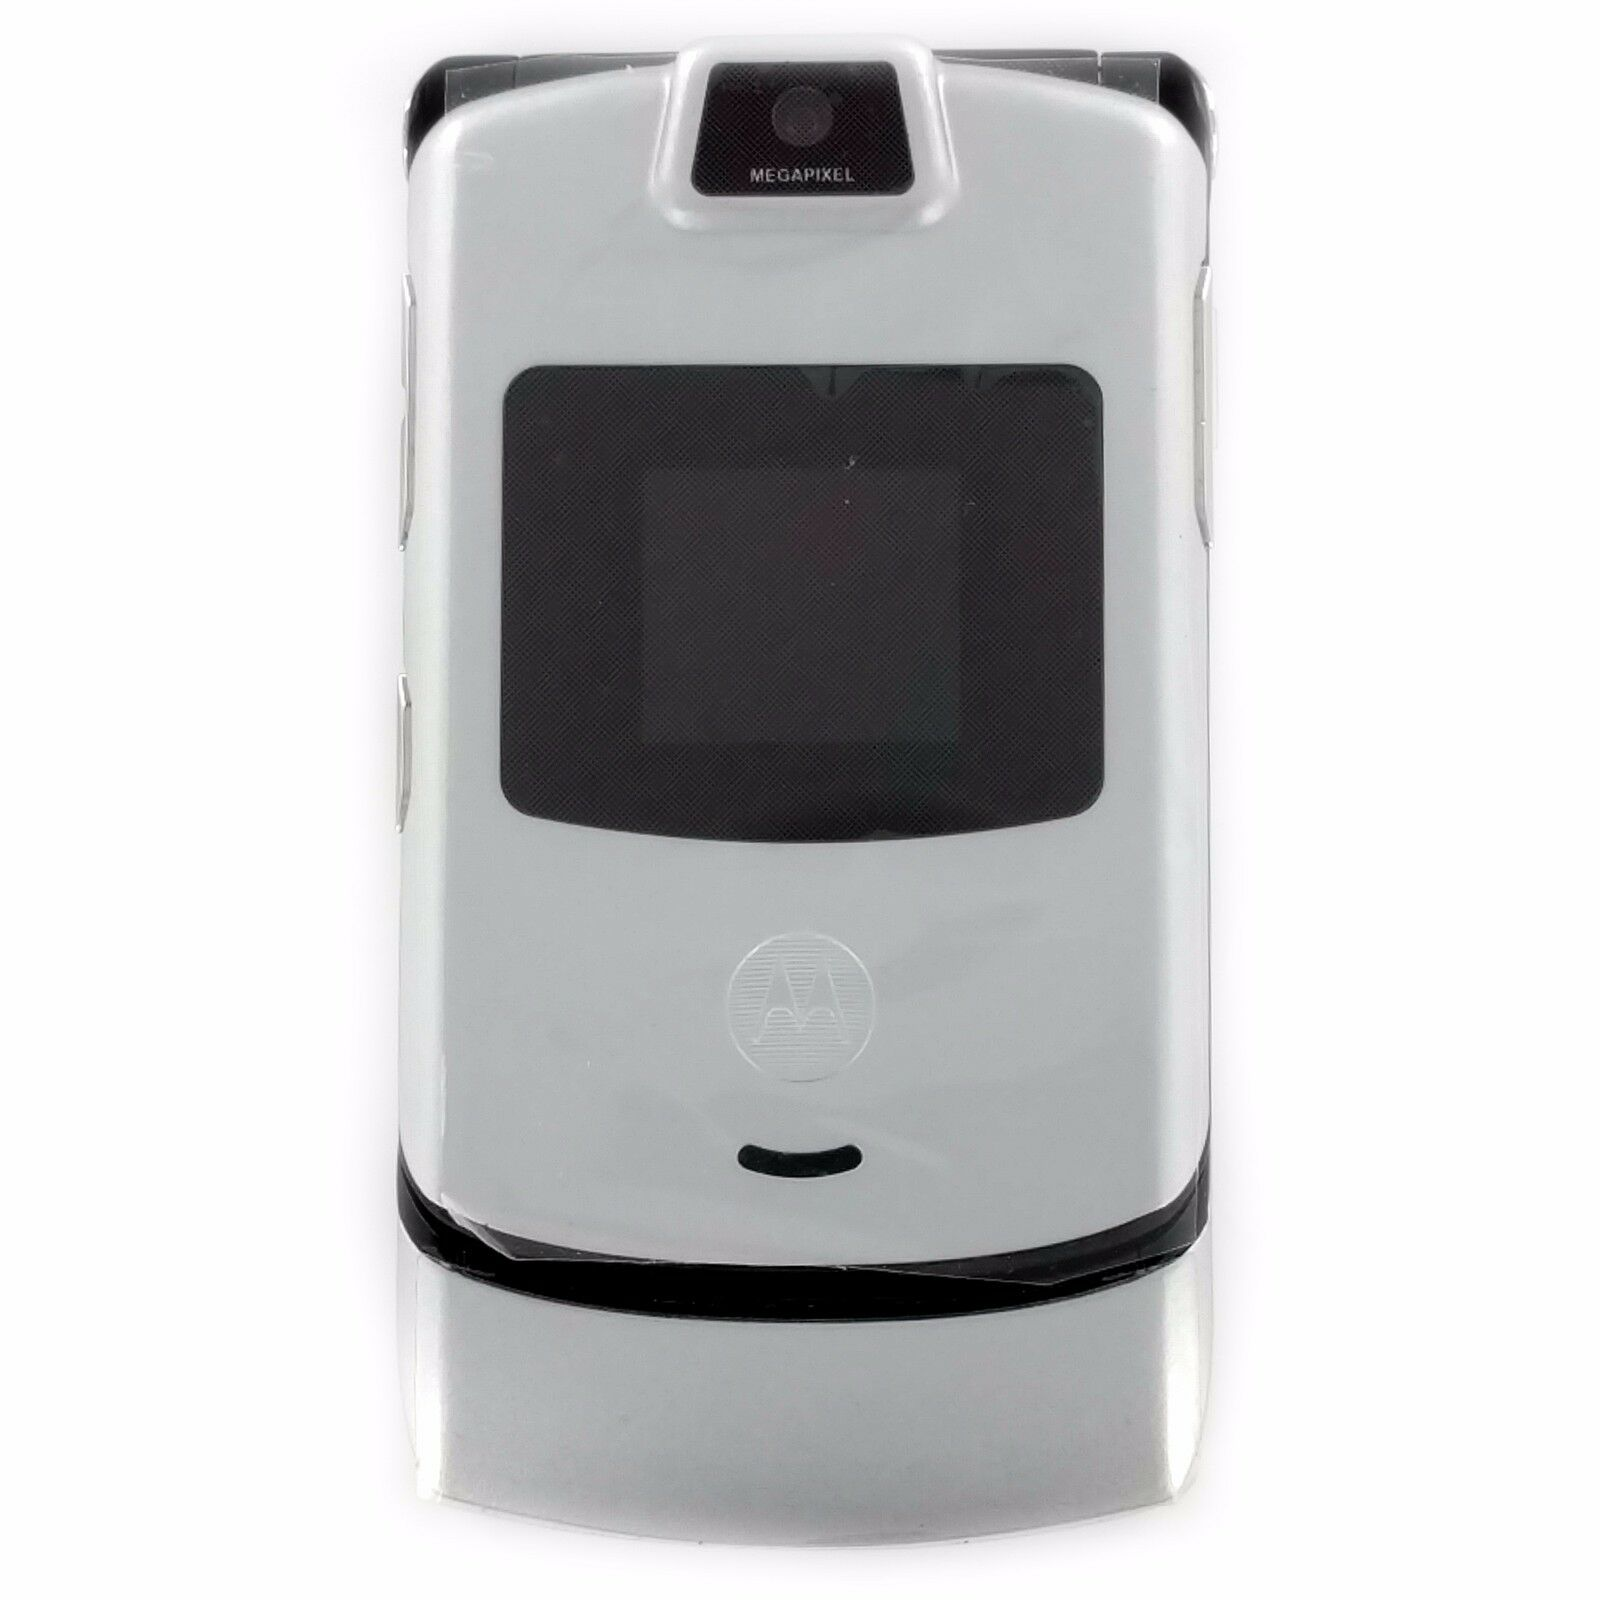 Motorola Razr V3m Silver Verizon Flip Cell Phone Retro T9...